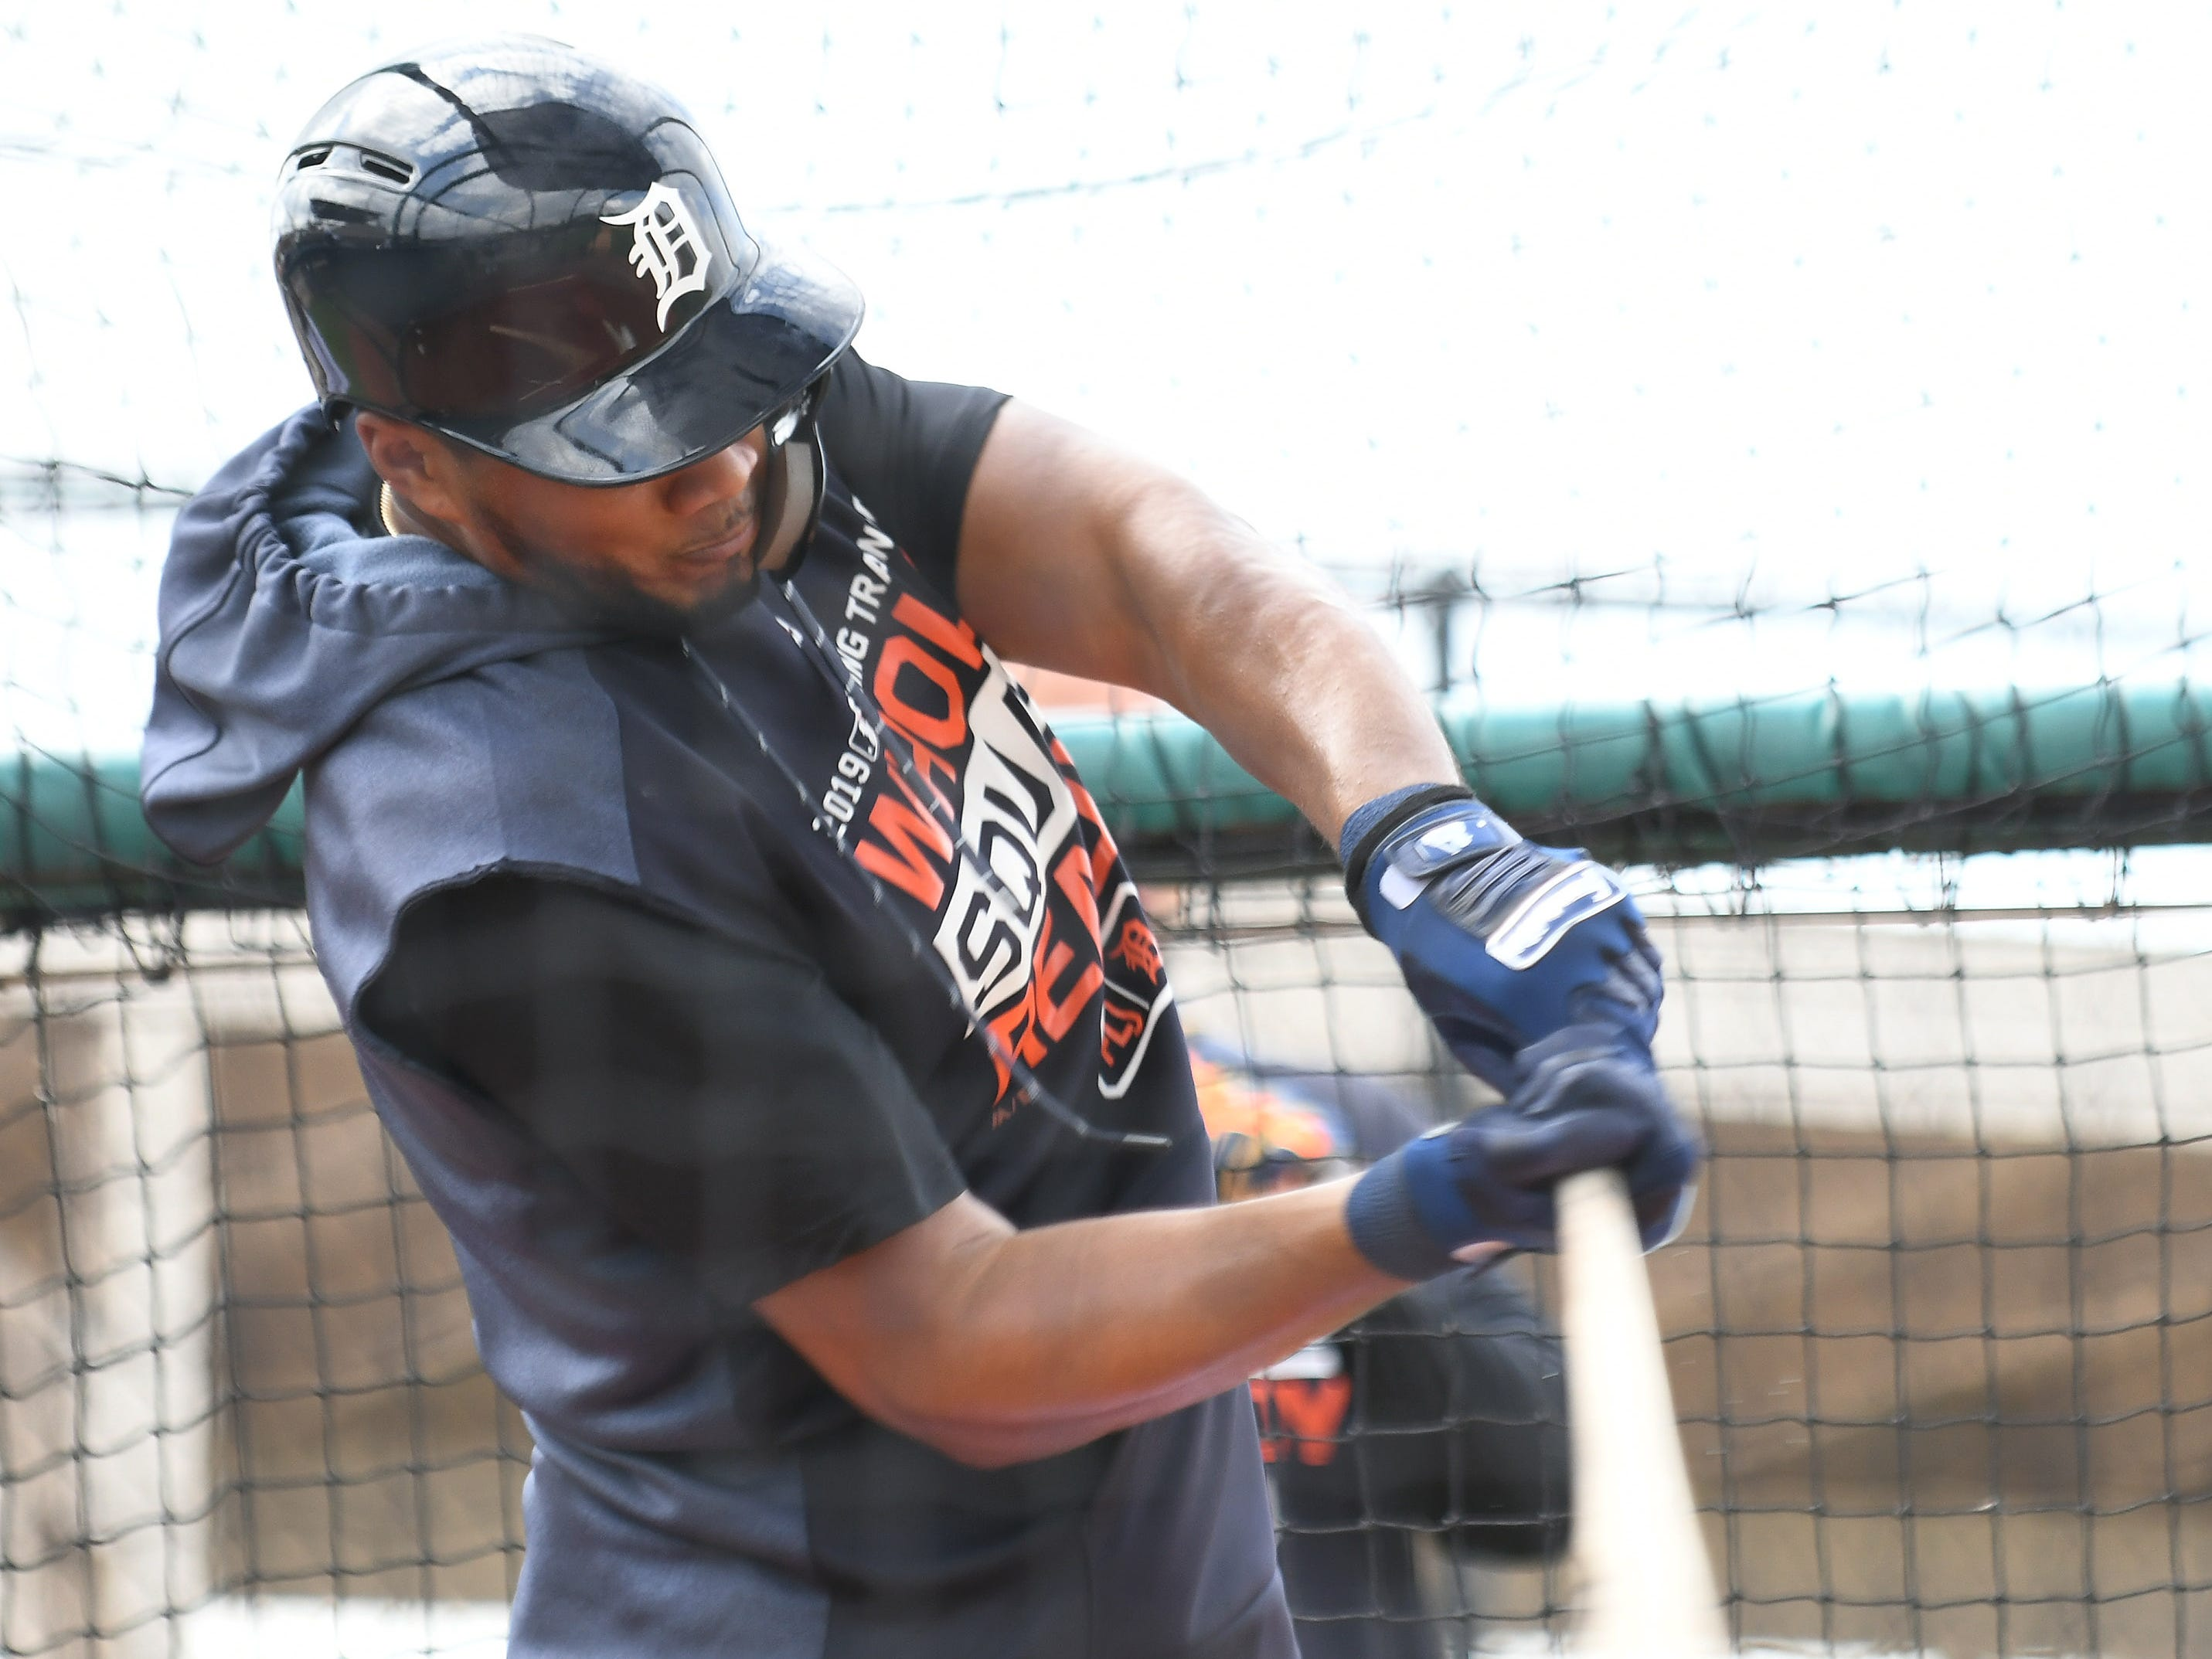 Tigers' Jeimer Candelario takes live batting practice.